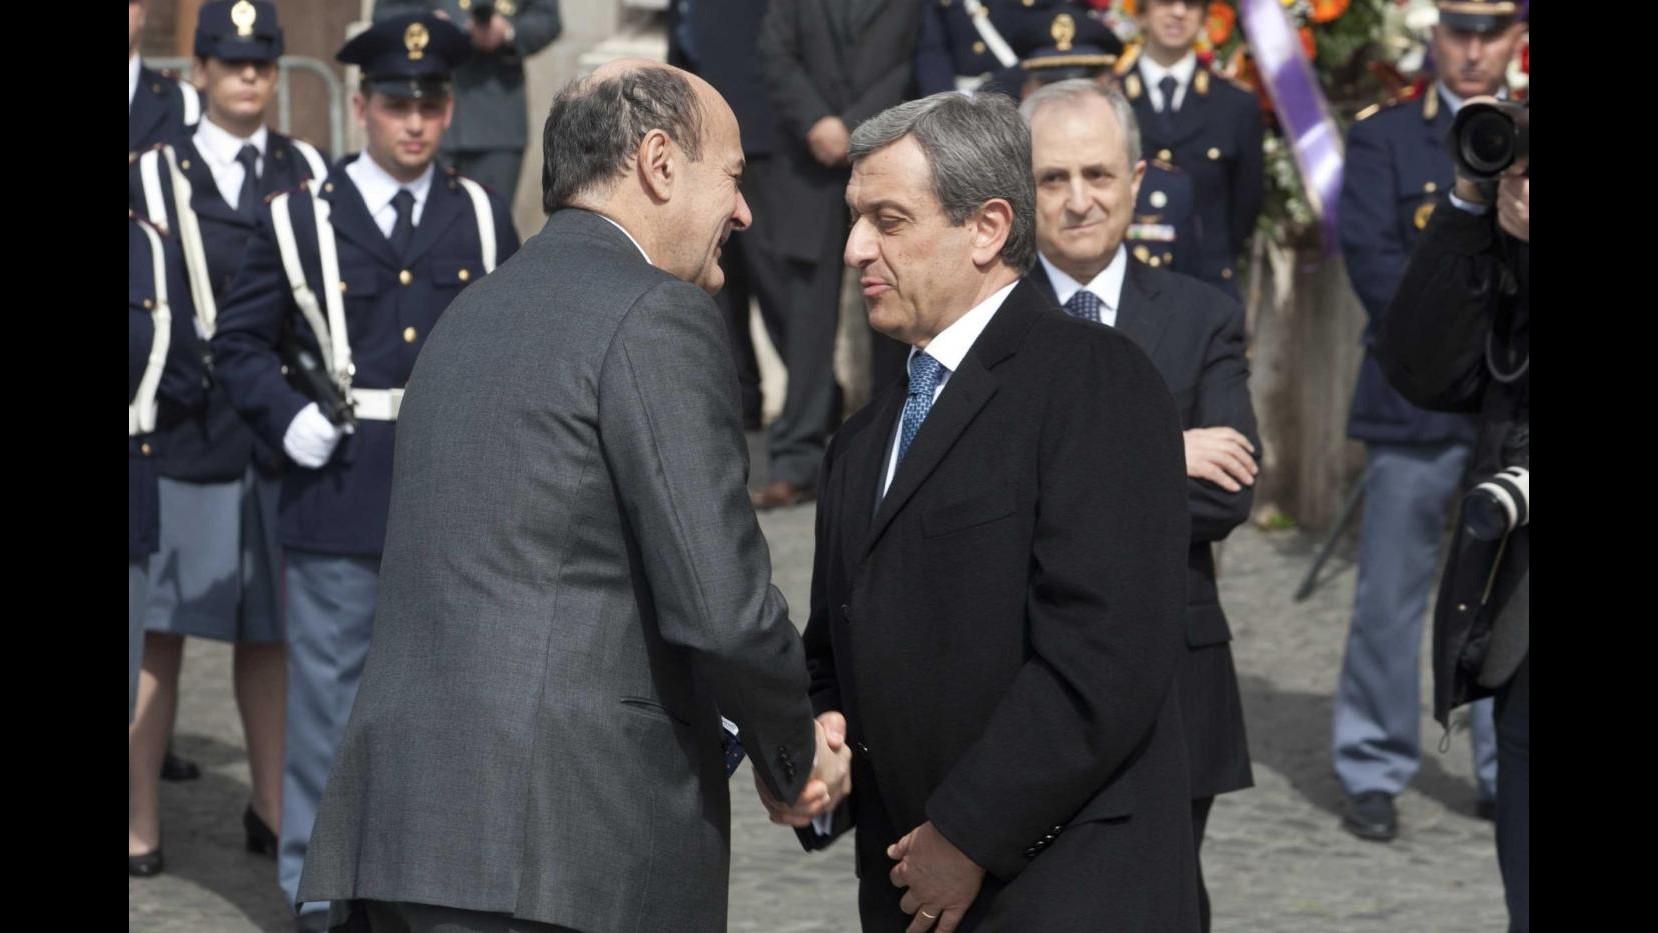 Milano, Governo nomina prefetto Alessandro Marangoni